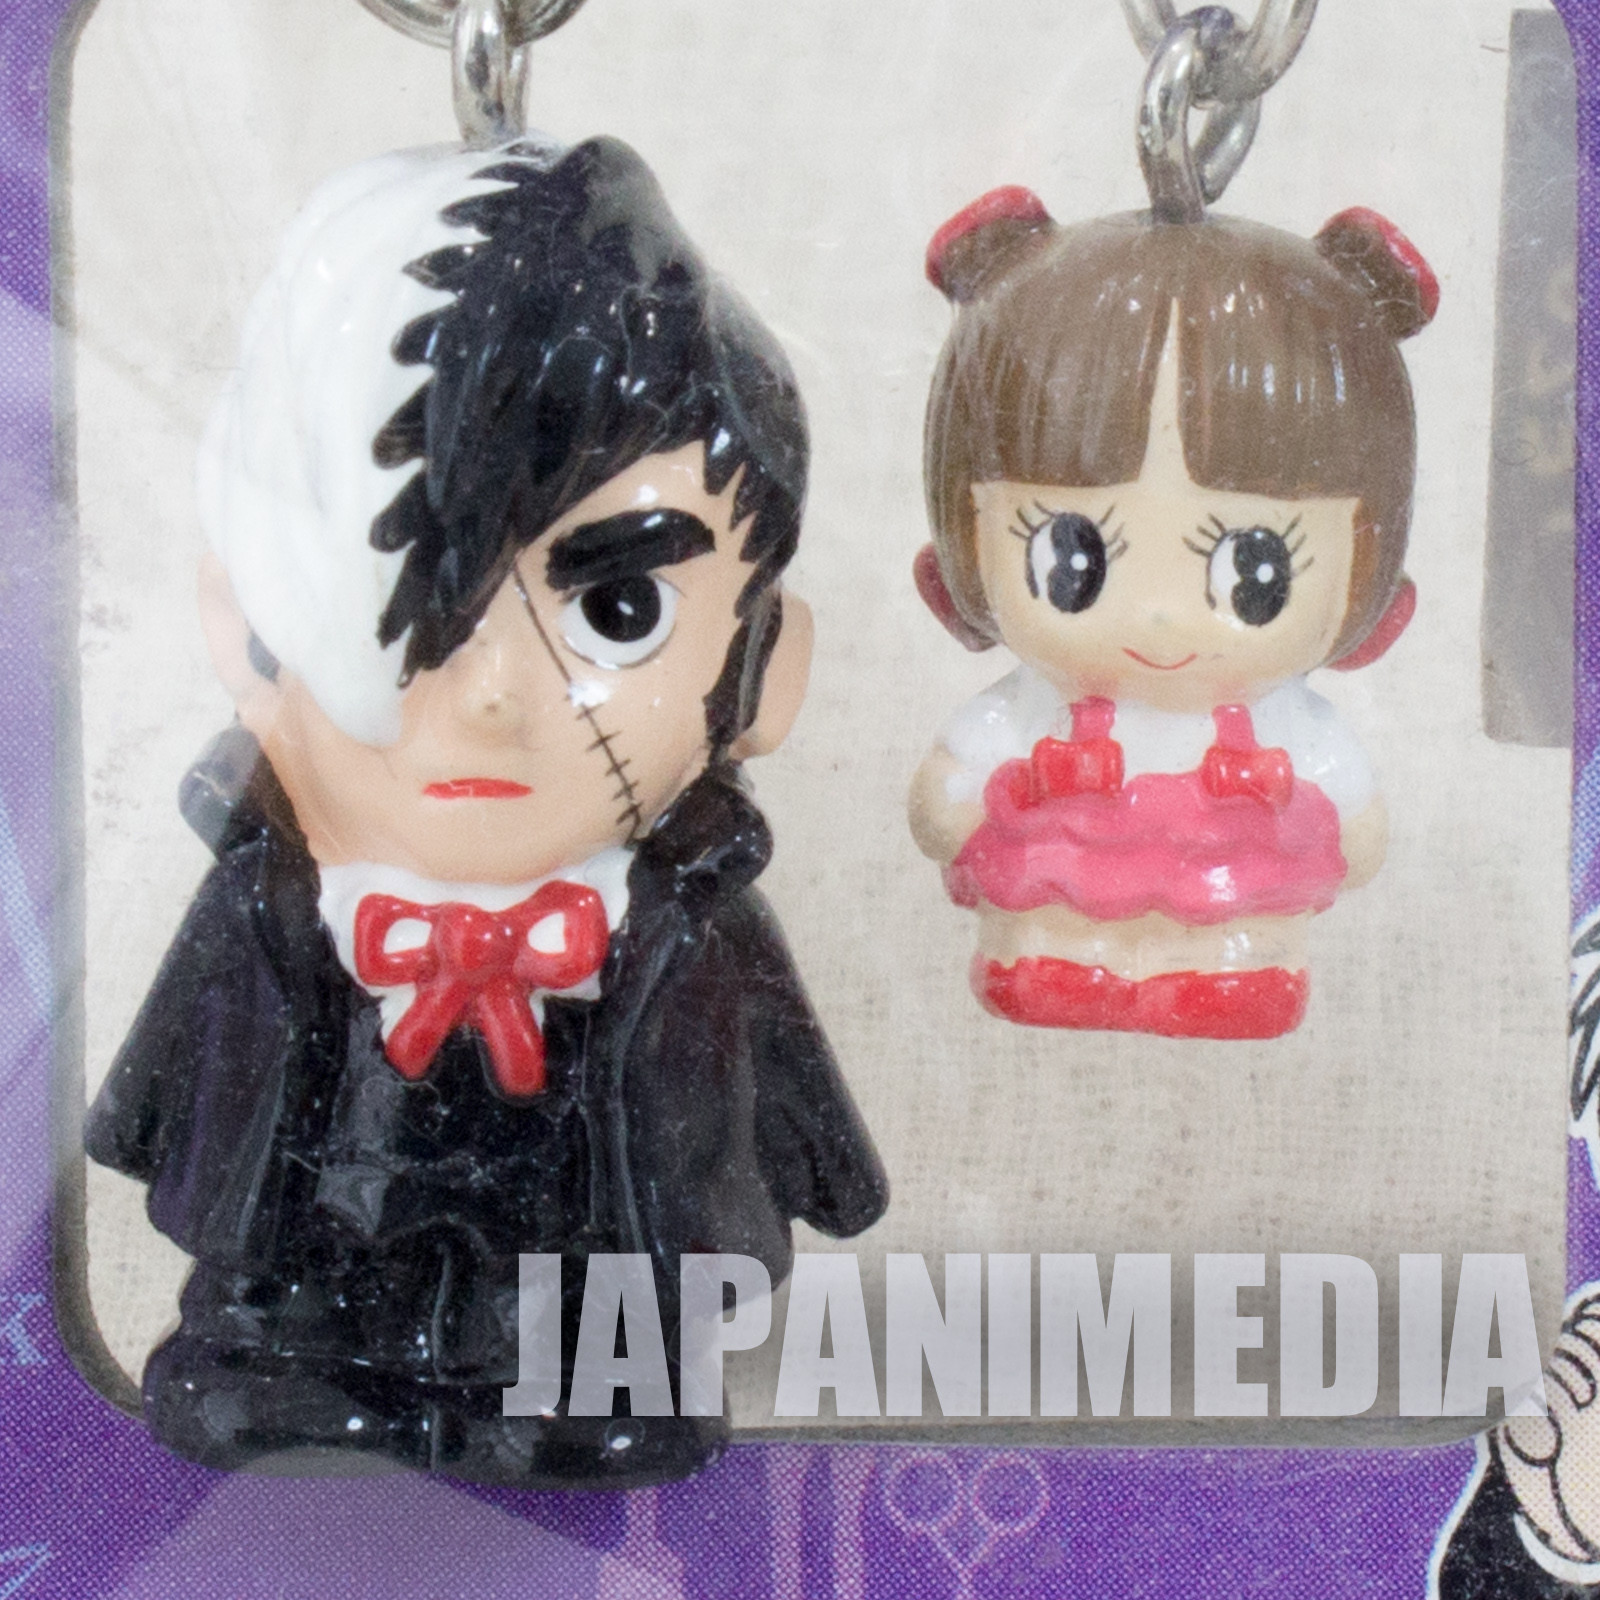 Black Jack Black Jack & Pinoko Mascot Figure charm 2pc set JAPAN ANIME